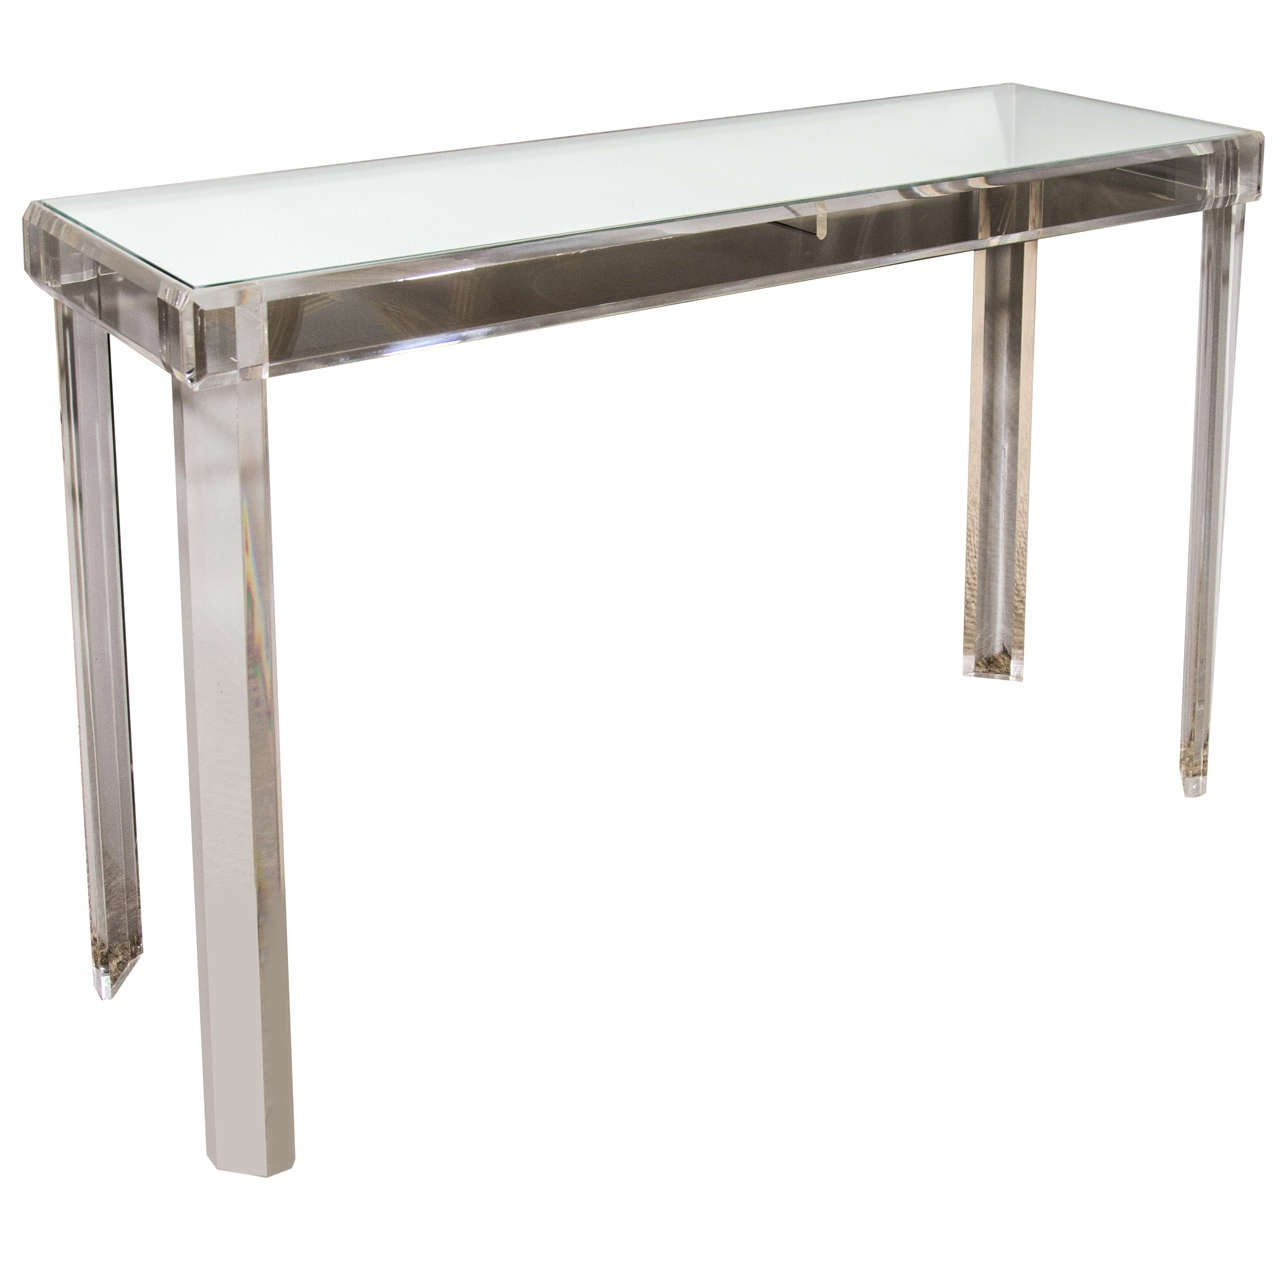 for Perspex furniture